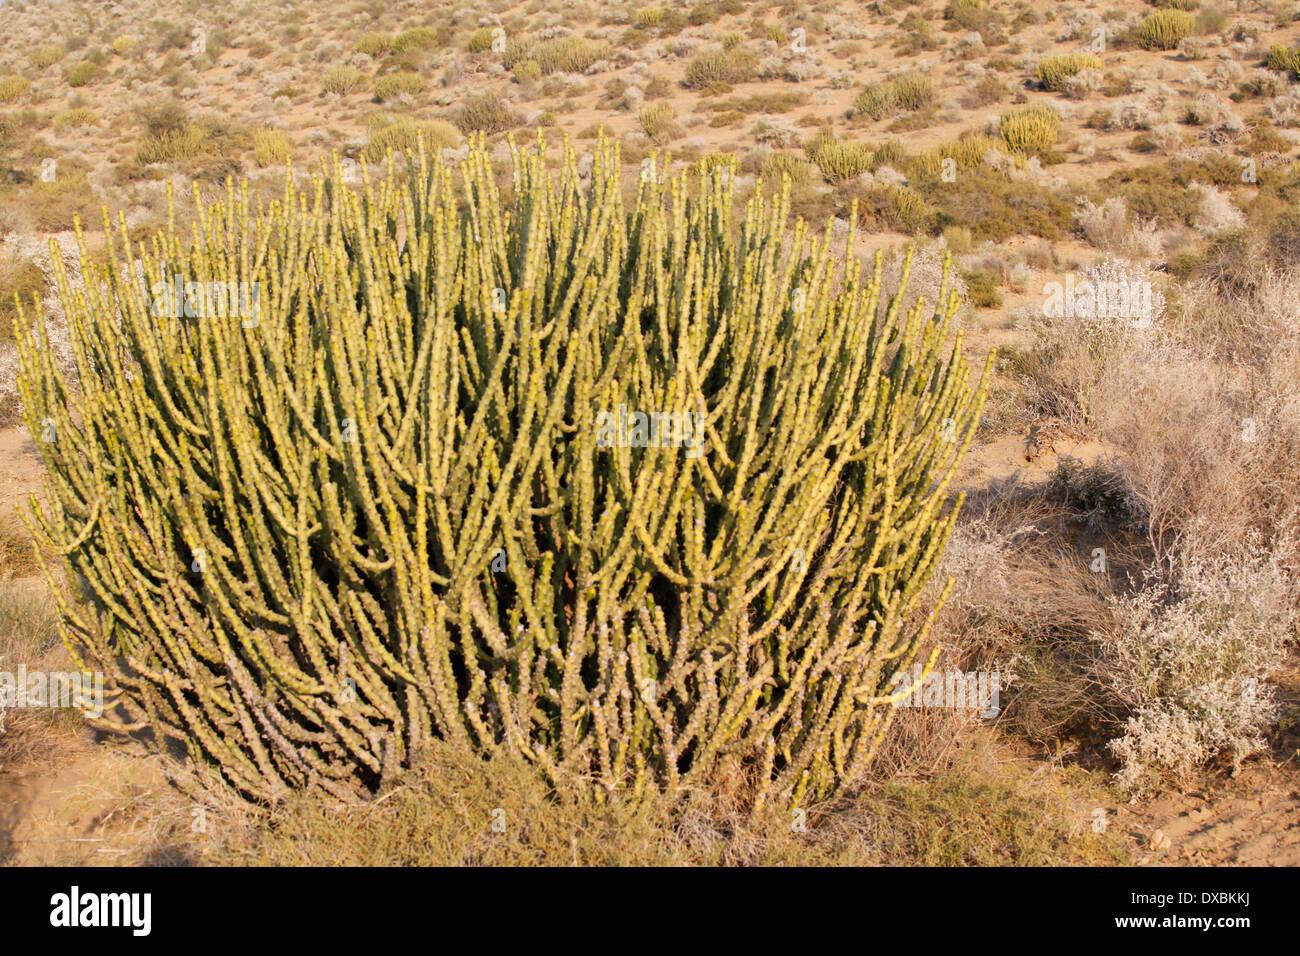 Cactus. Thar desert, Jaisalmer. Rajasthan, India Stock ...